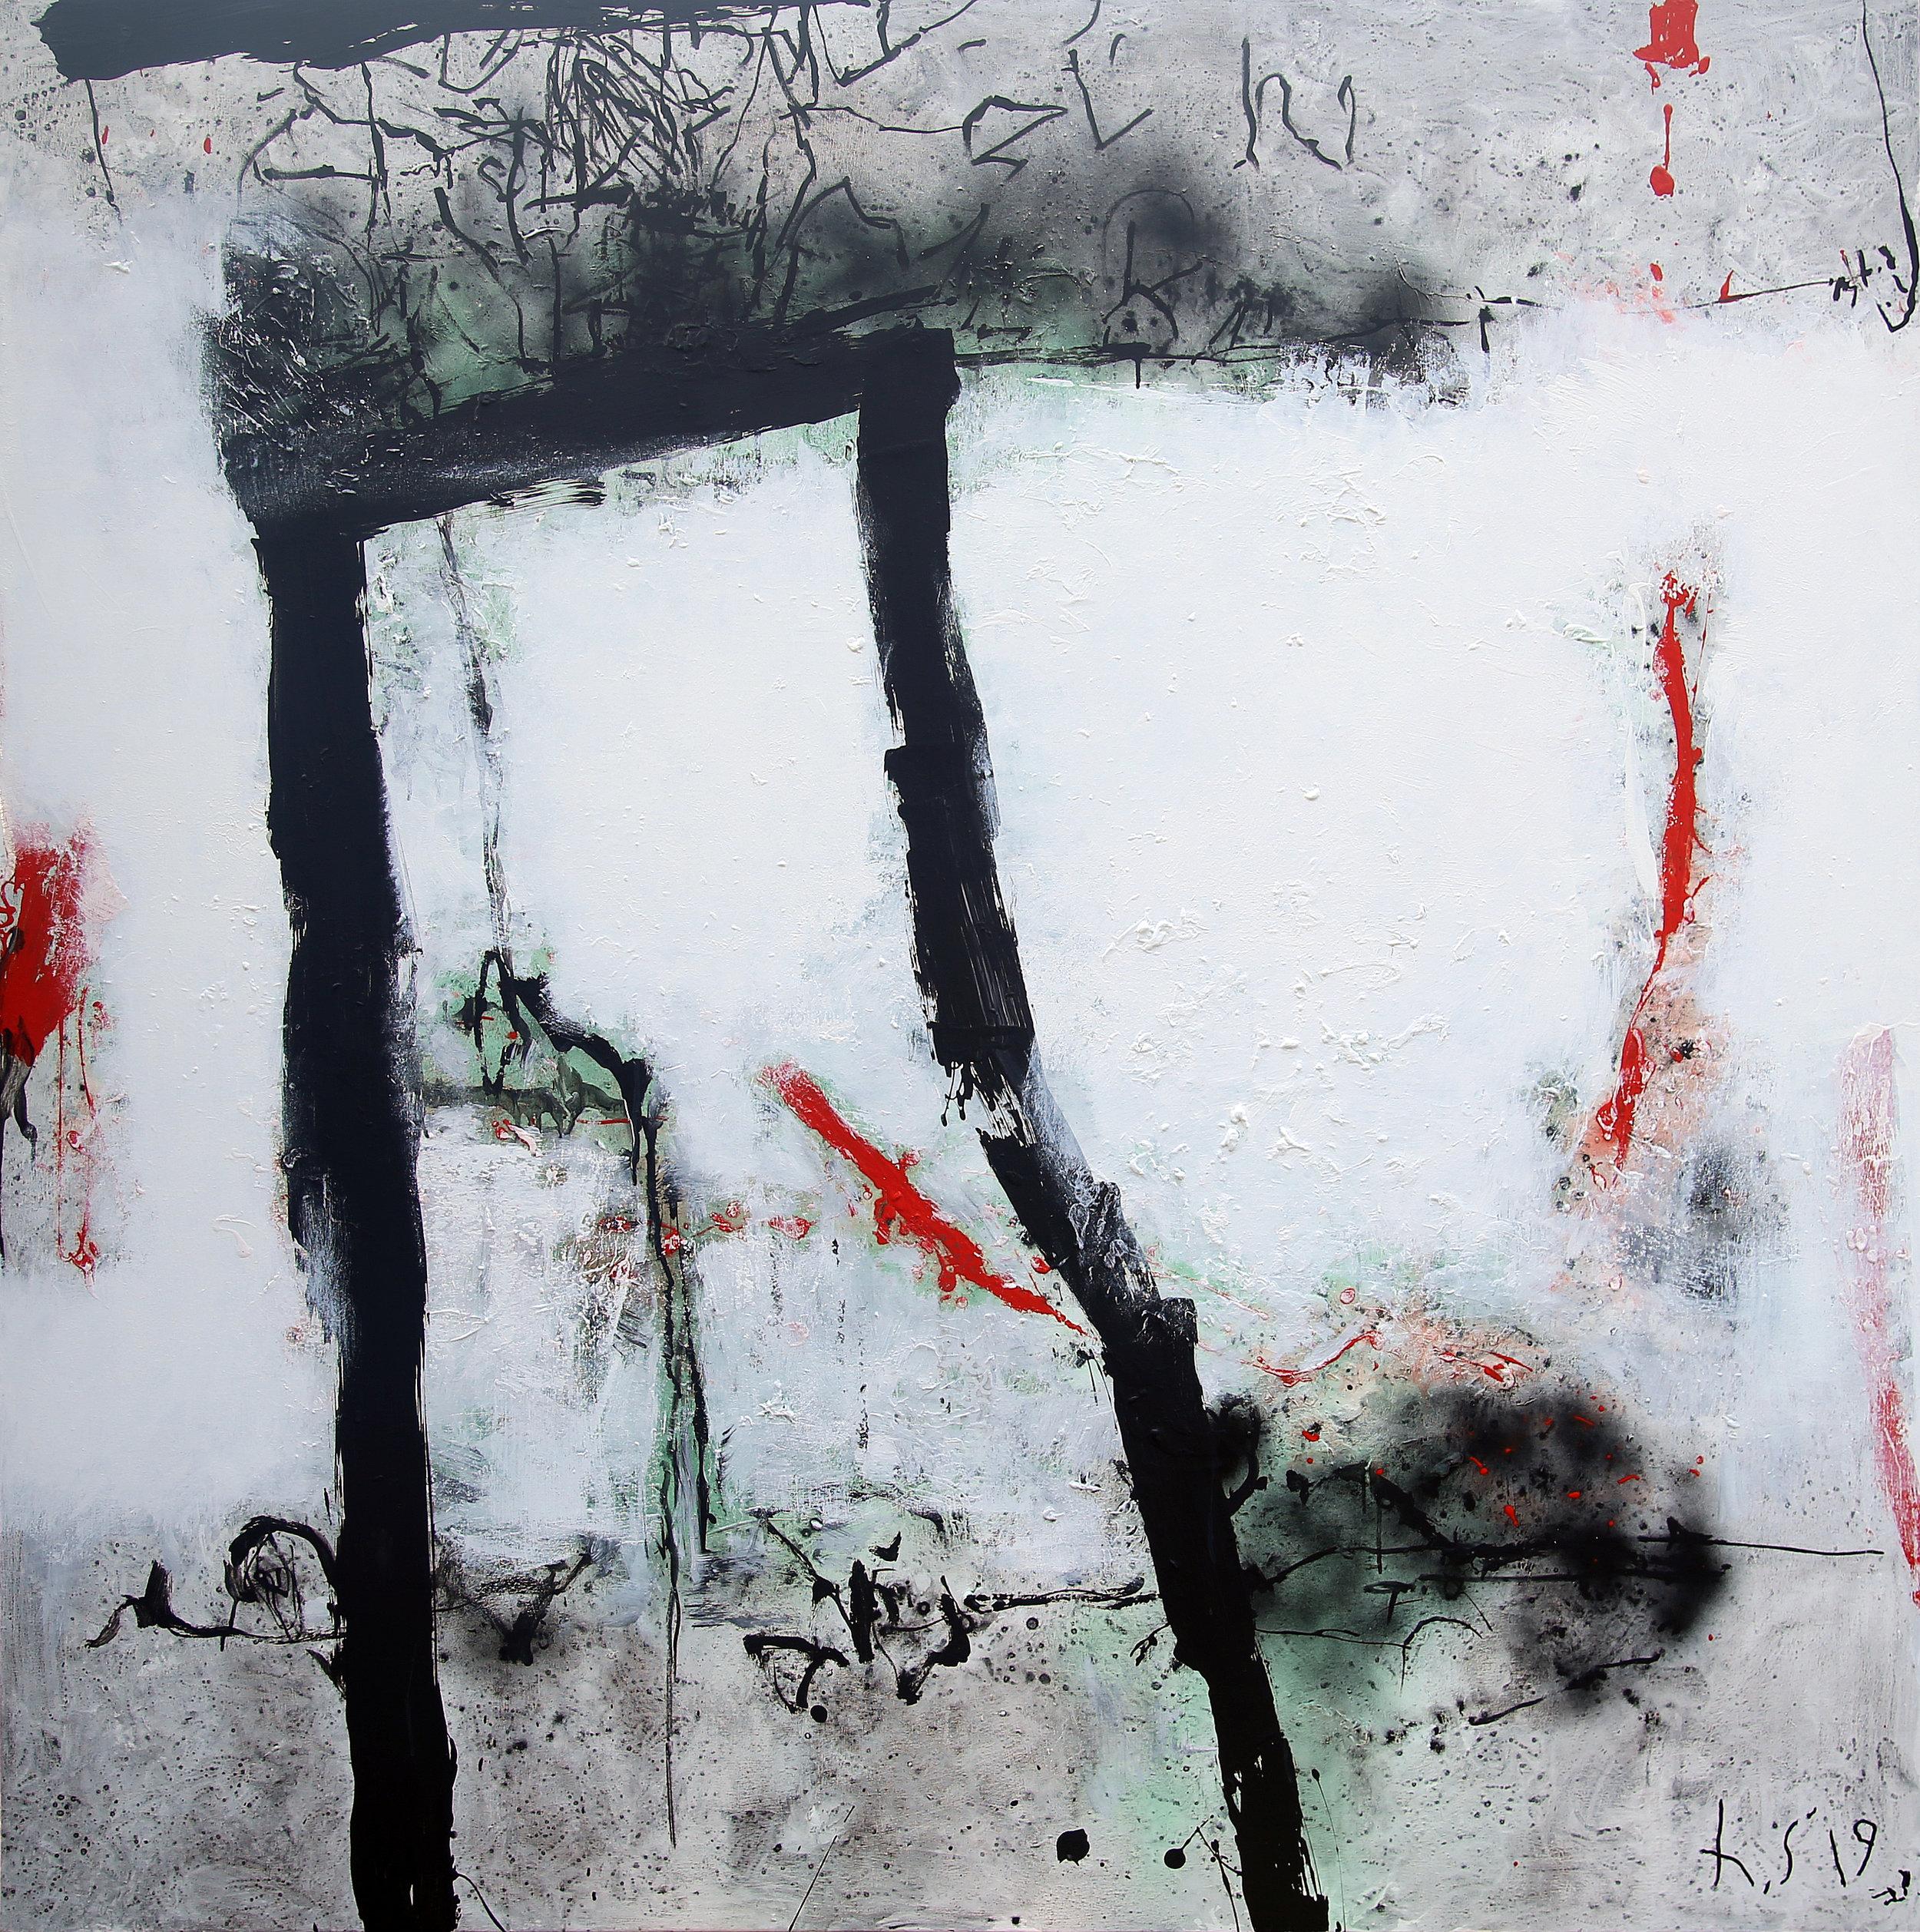 Artist: HEDI SOETARDJA, INDONESIA  Title: Sesaat Melintas Merah Medium: acrylic, spray paint, rubber pasta and marker on canvas  Dimension: 200 X 200 cm  Year: 2019    SOLD